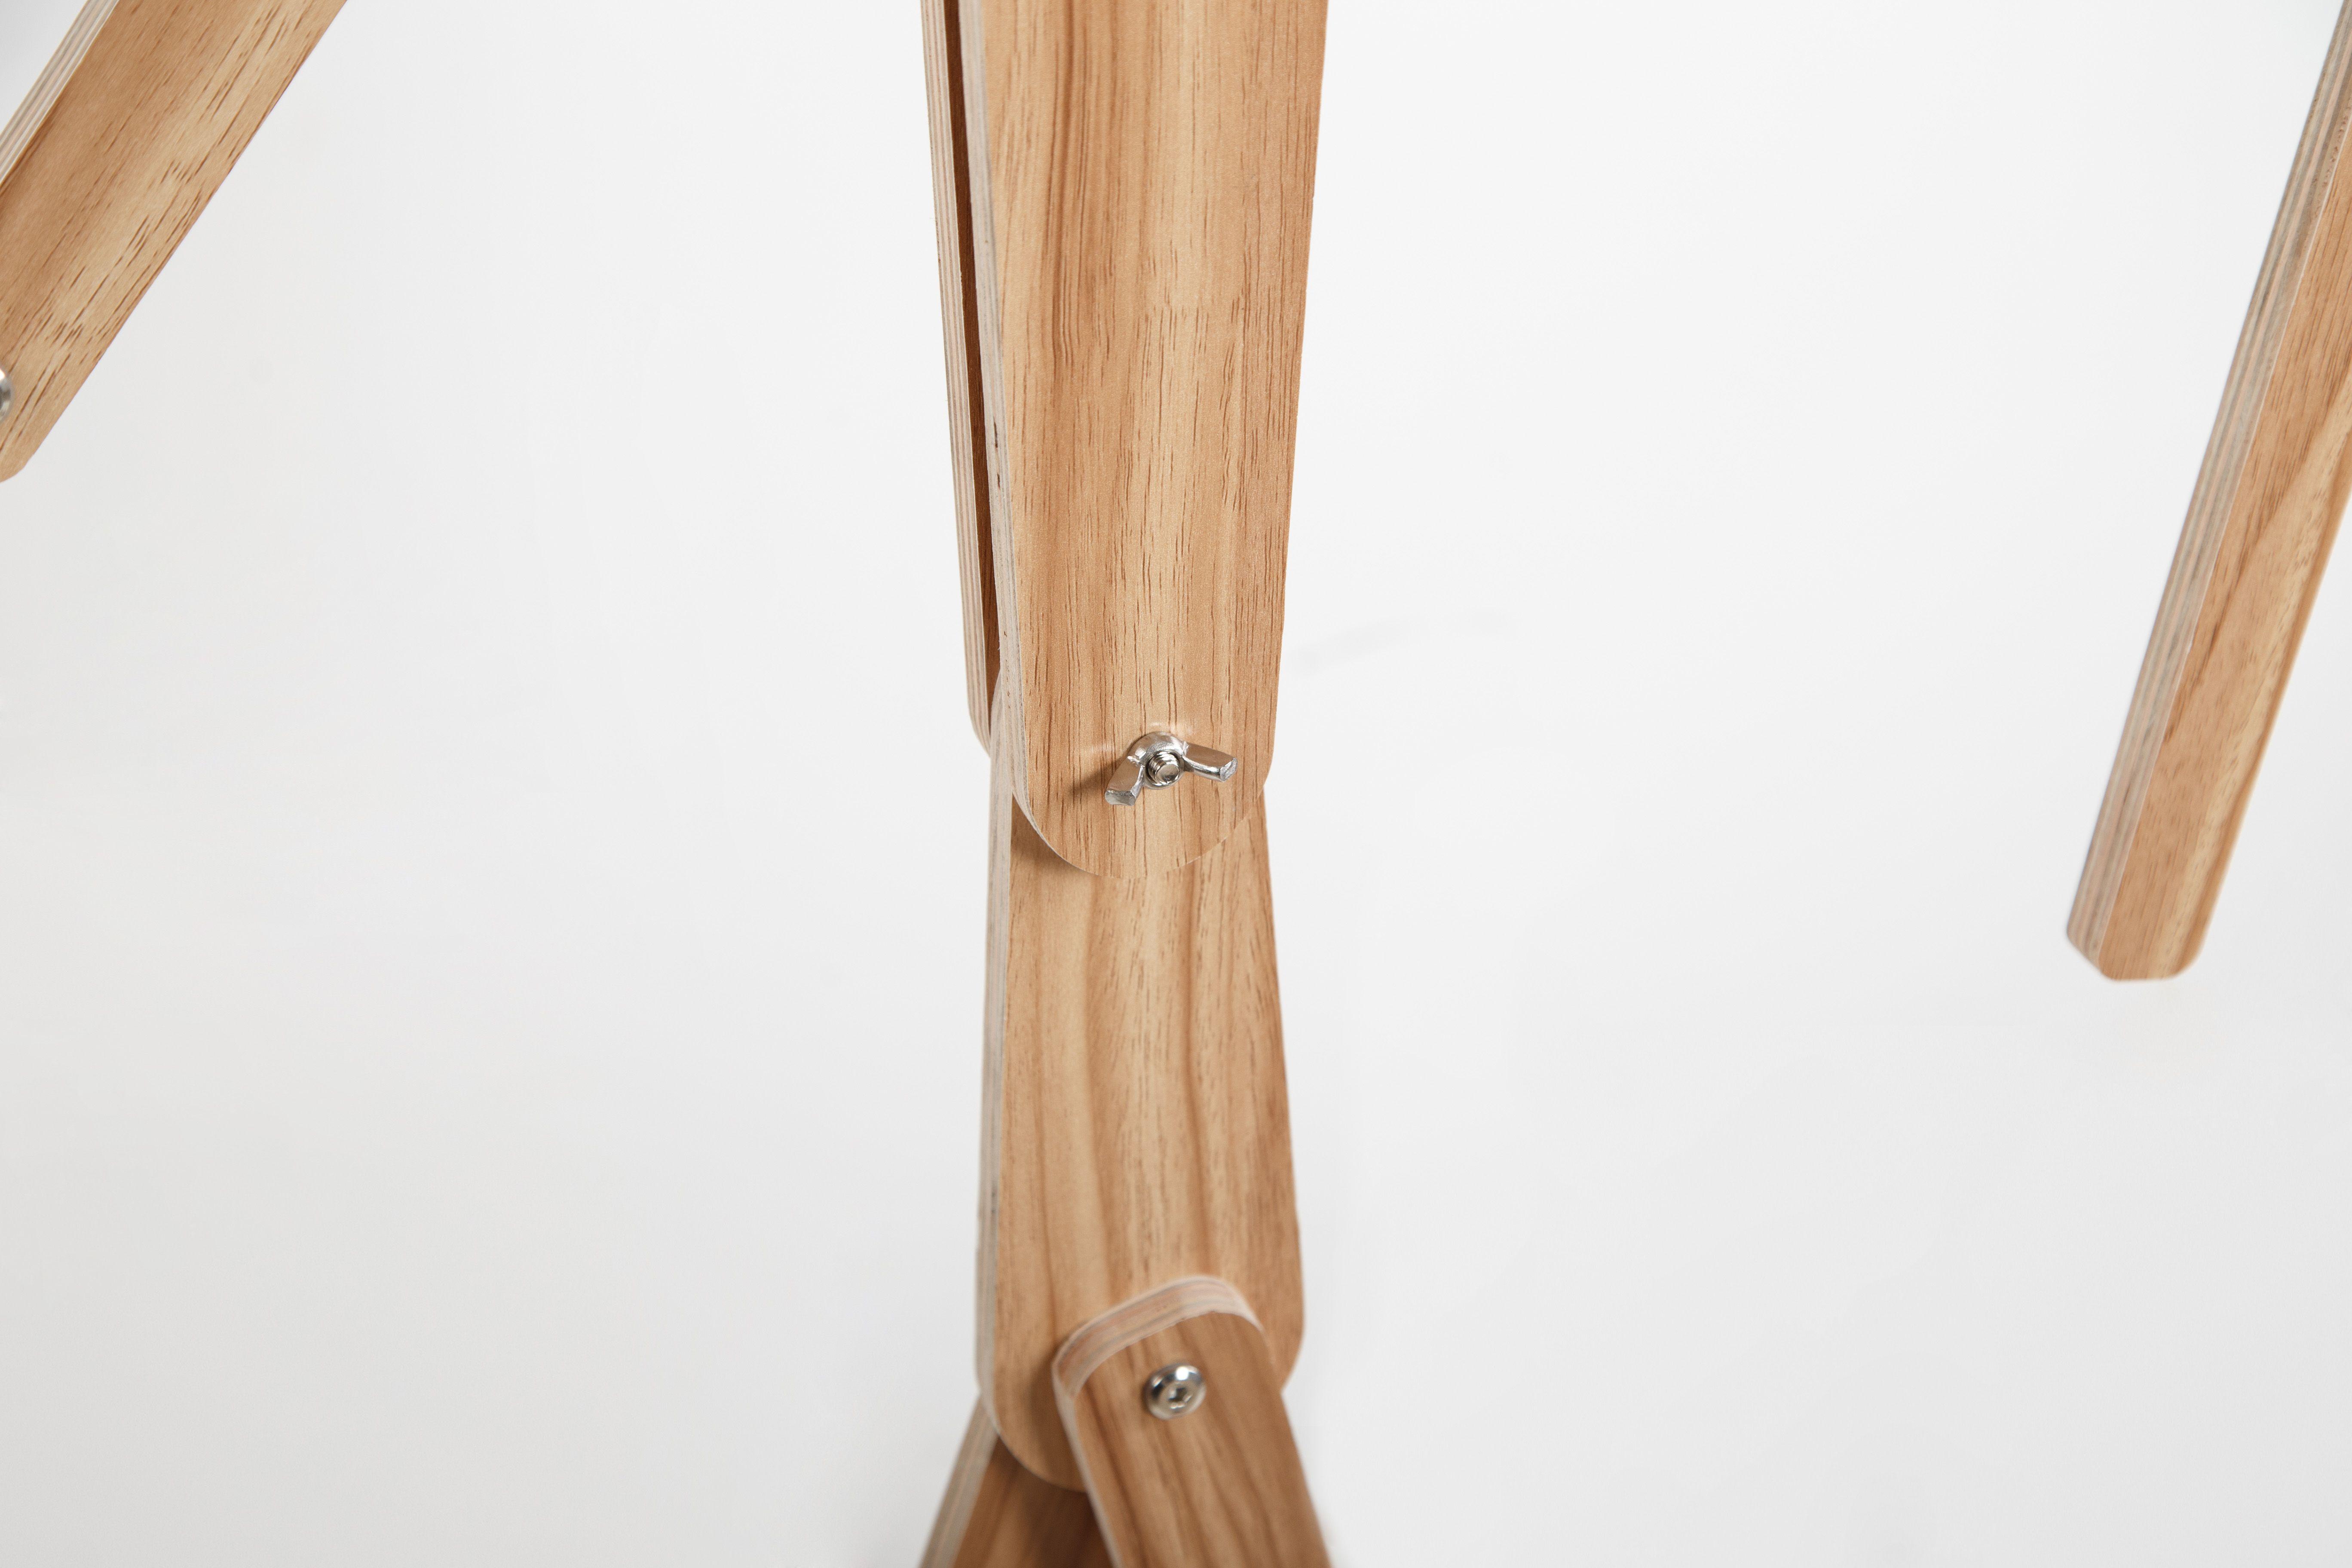 Diy Fancy Human Shape Standard Lamp With Flexible Arm